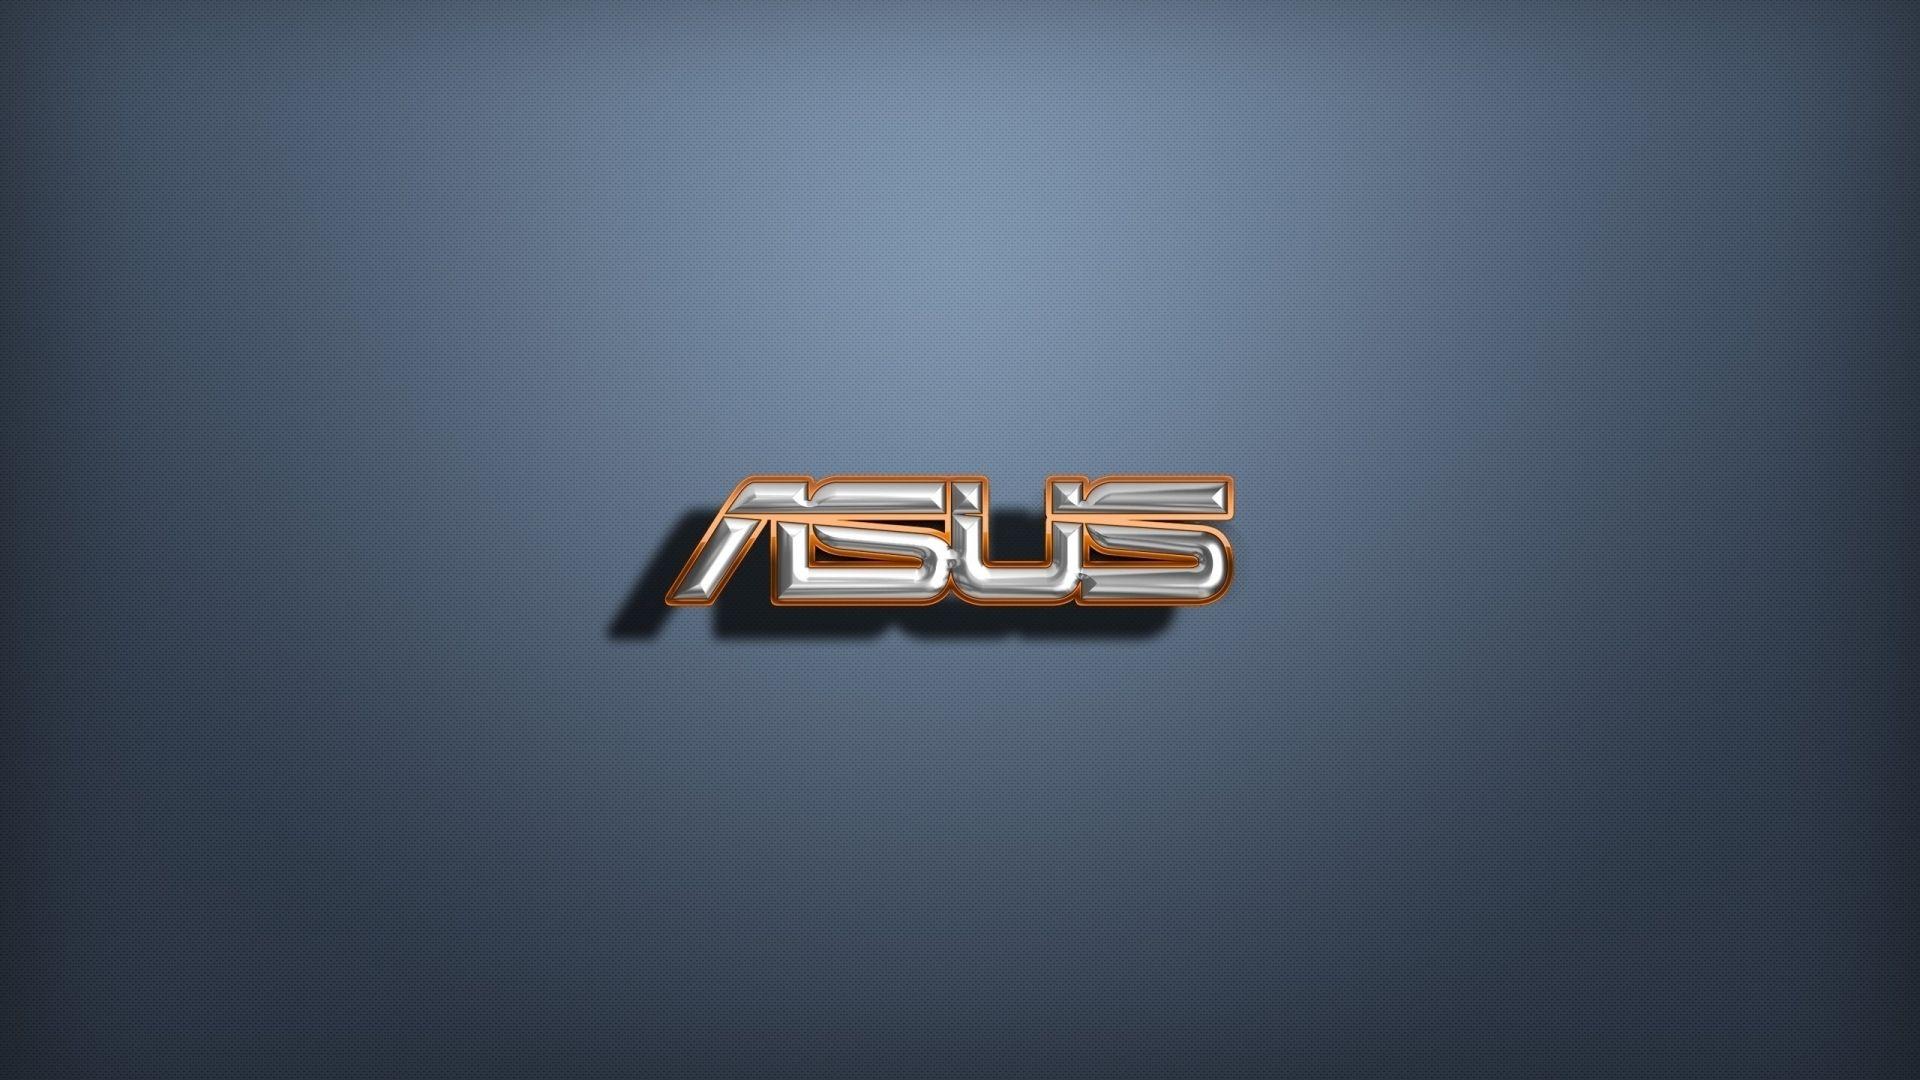 Asus 3D Logo Wallpaper Minimalist logo, Picture logo, Hd